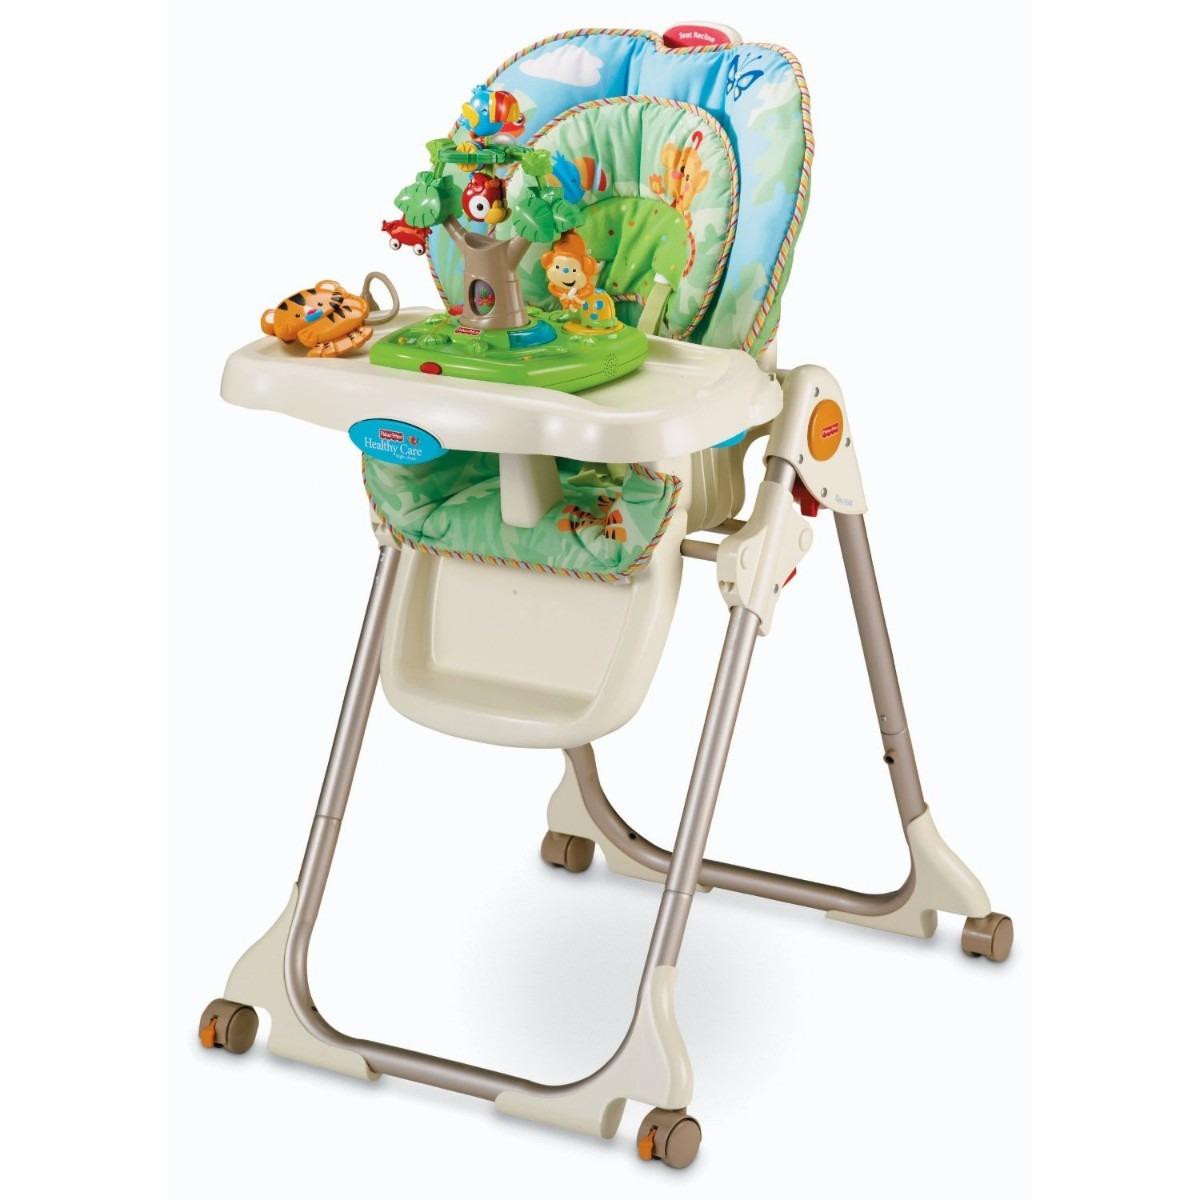 Silla fisher price para bebe imagui - Silla de mesa para bebe ...